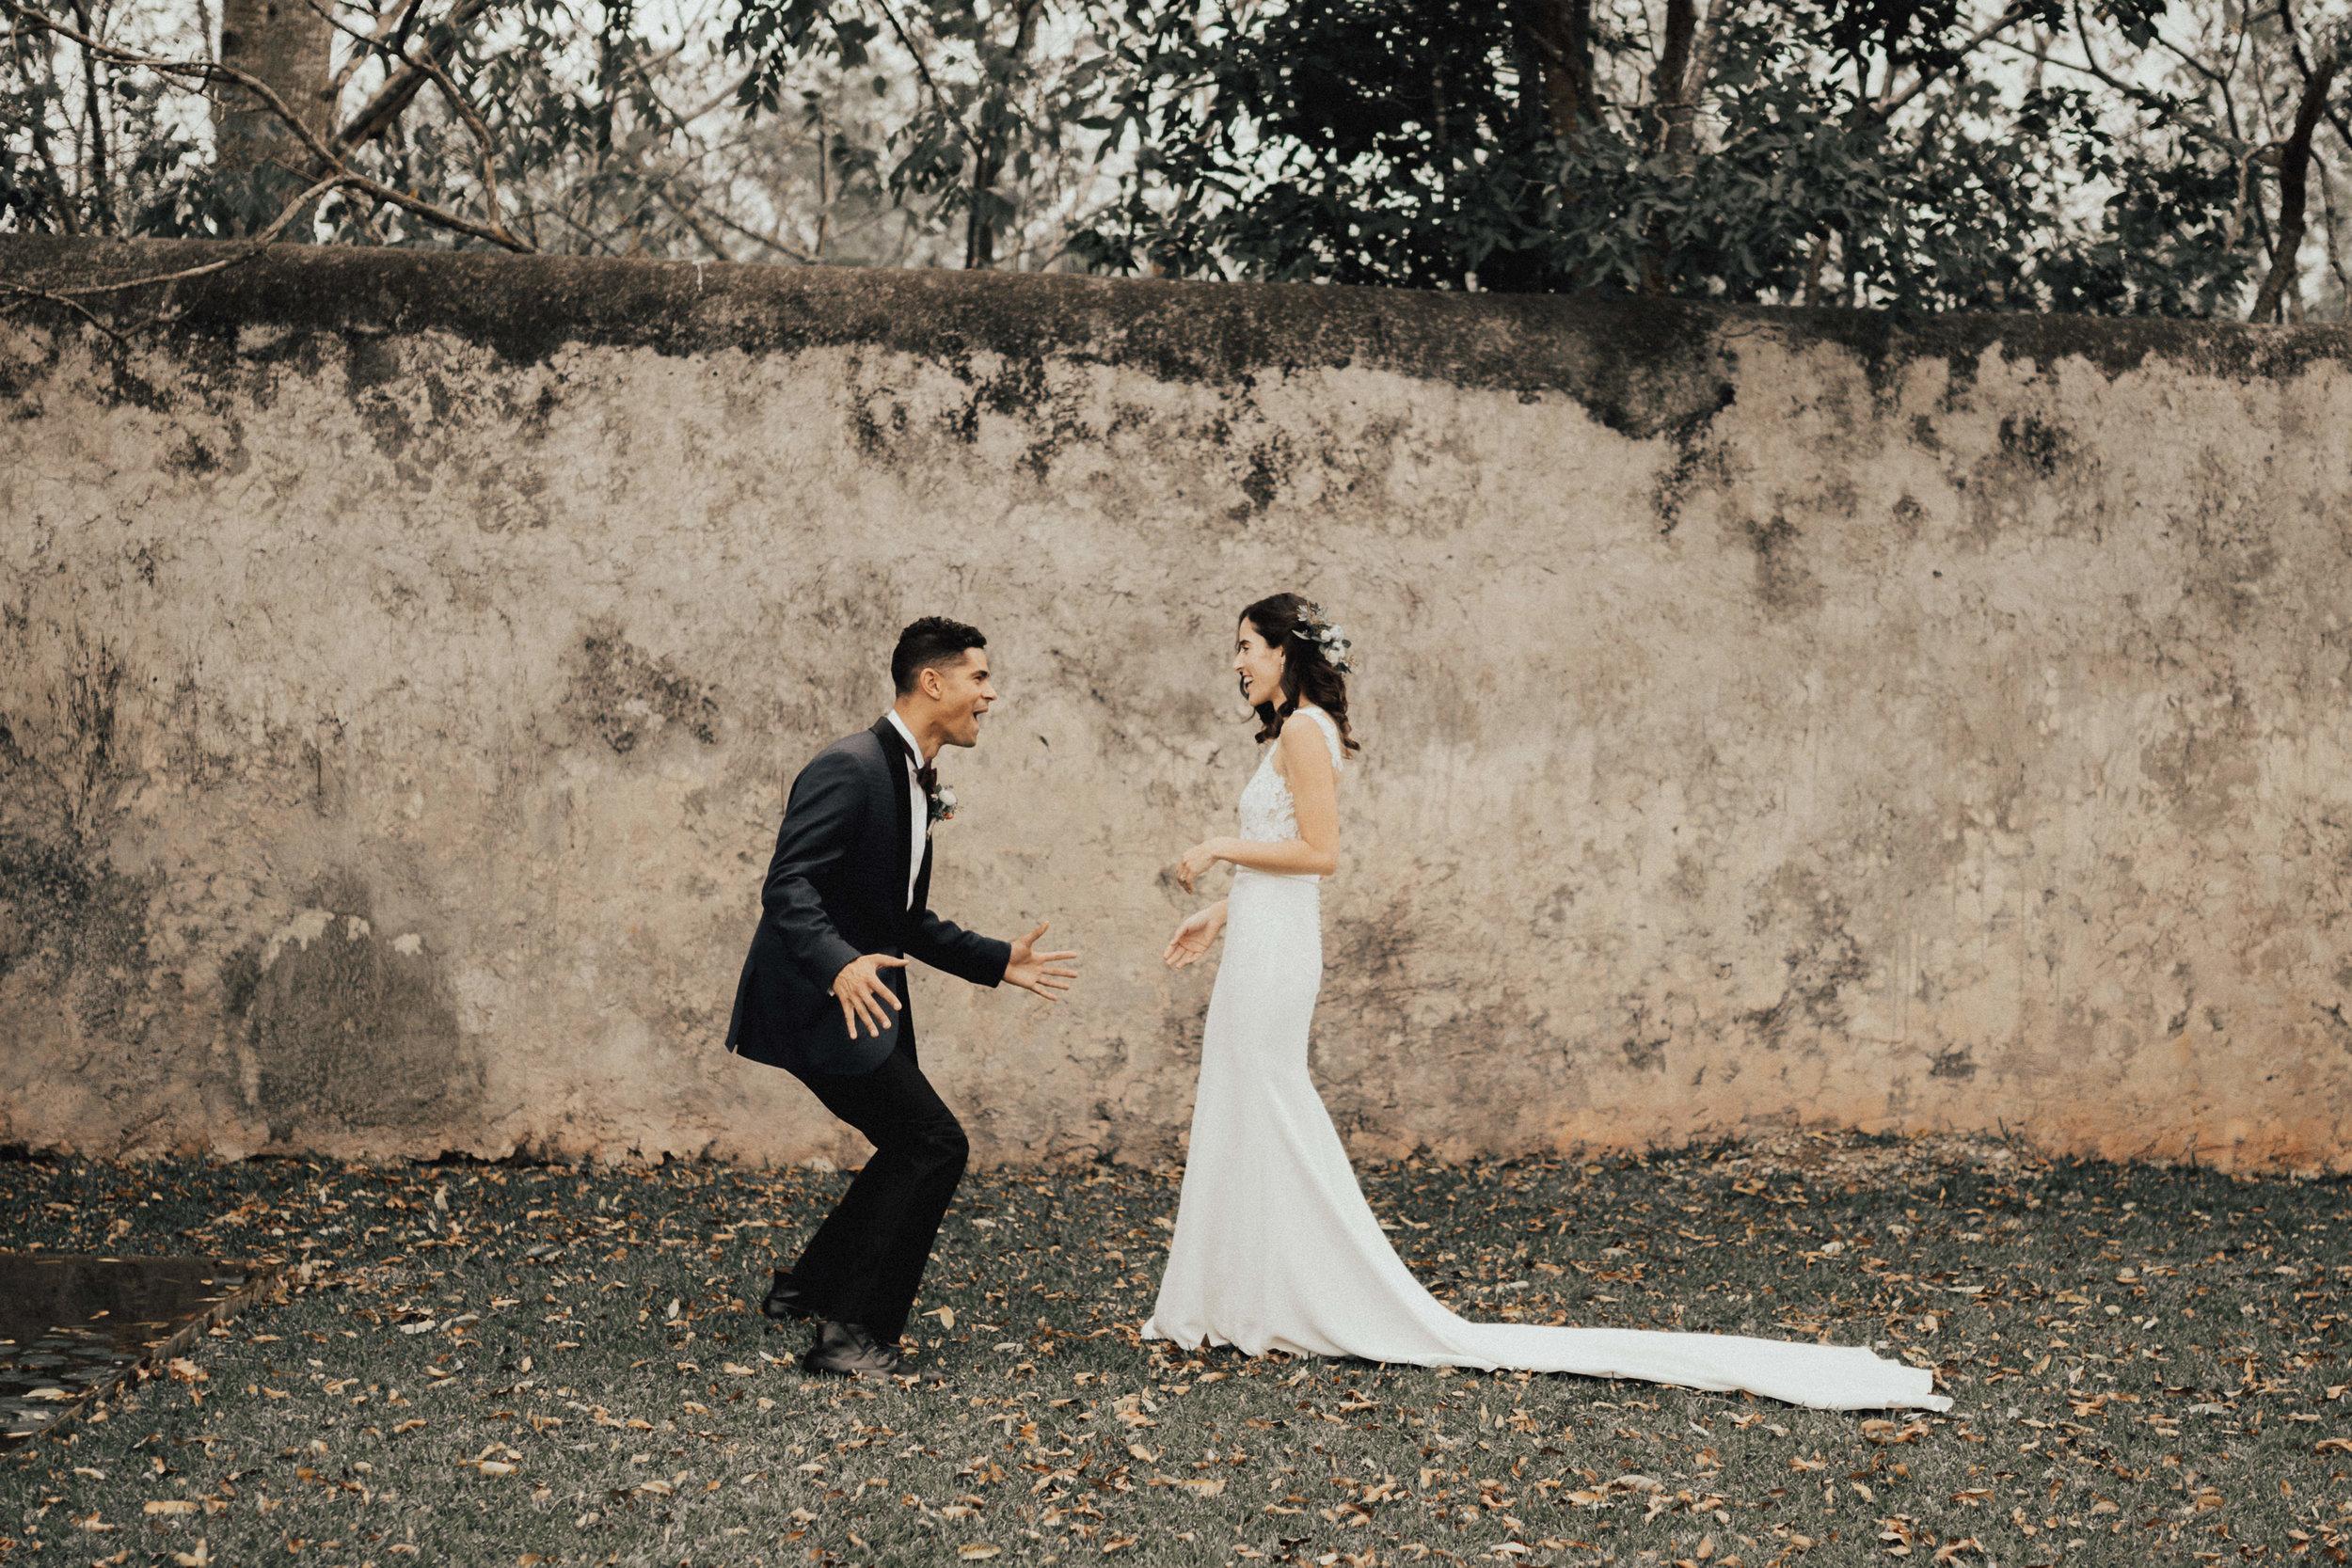 2 first look Tina Kai Merida Mexico Wedding  (9 of 120).jpg